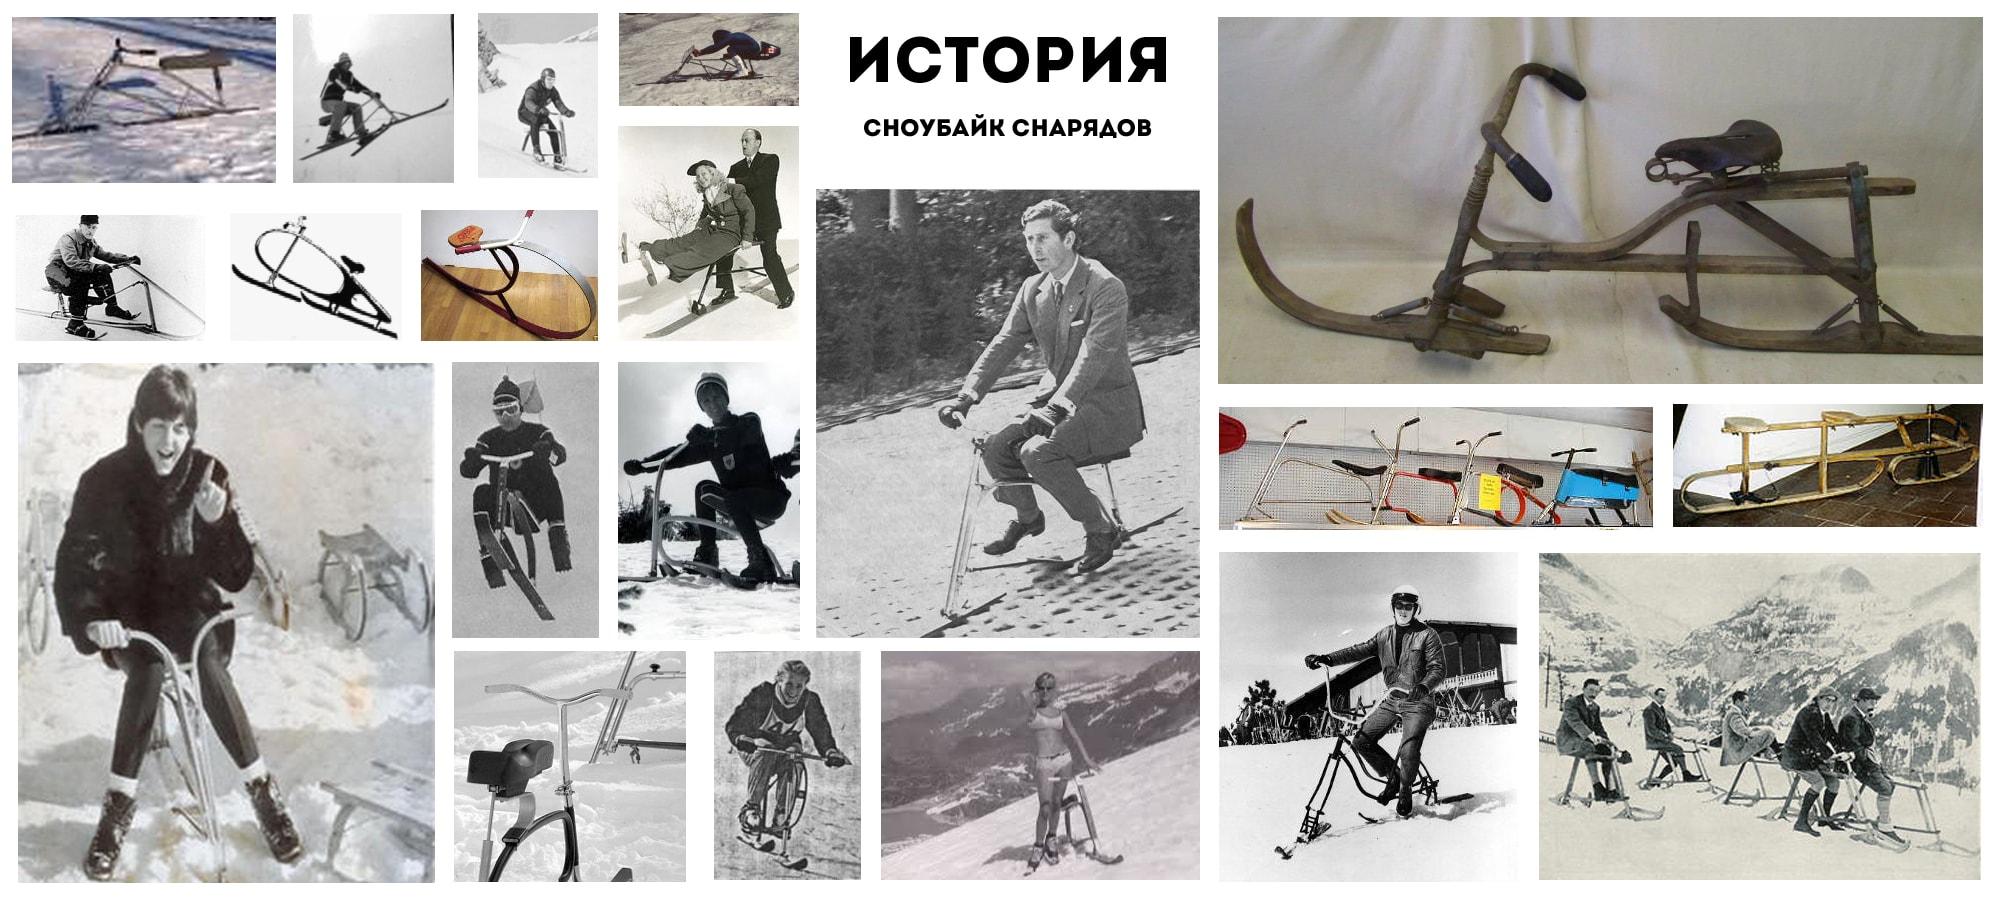 Snowbike-history_1